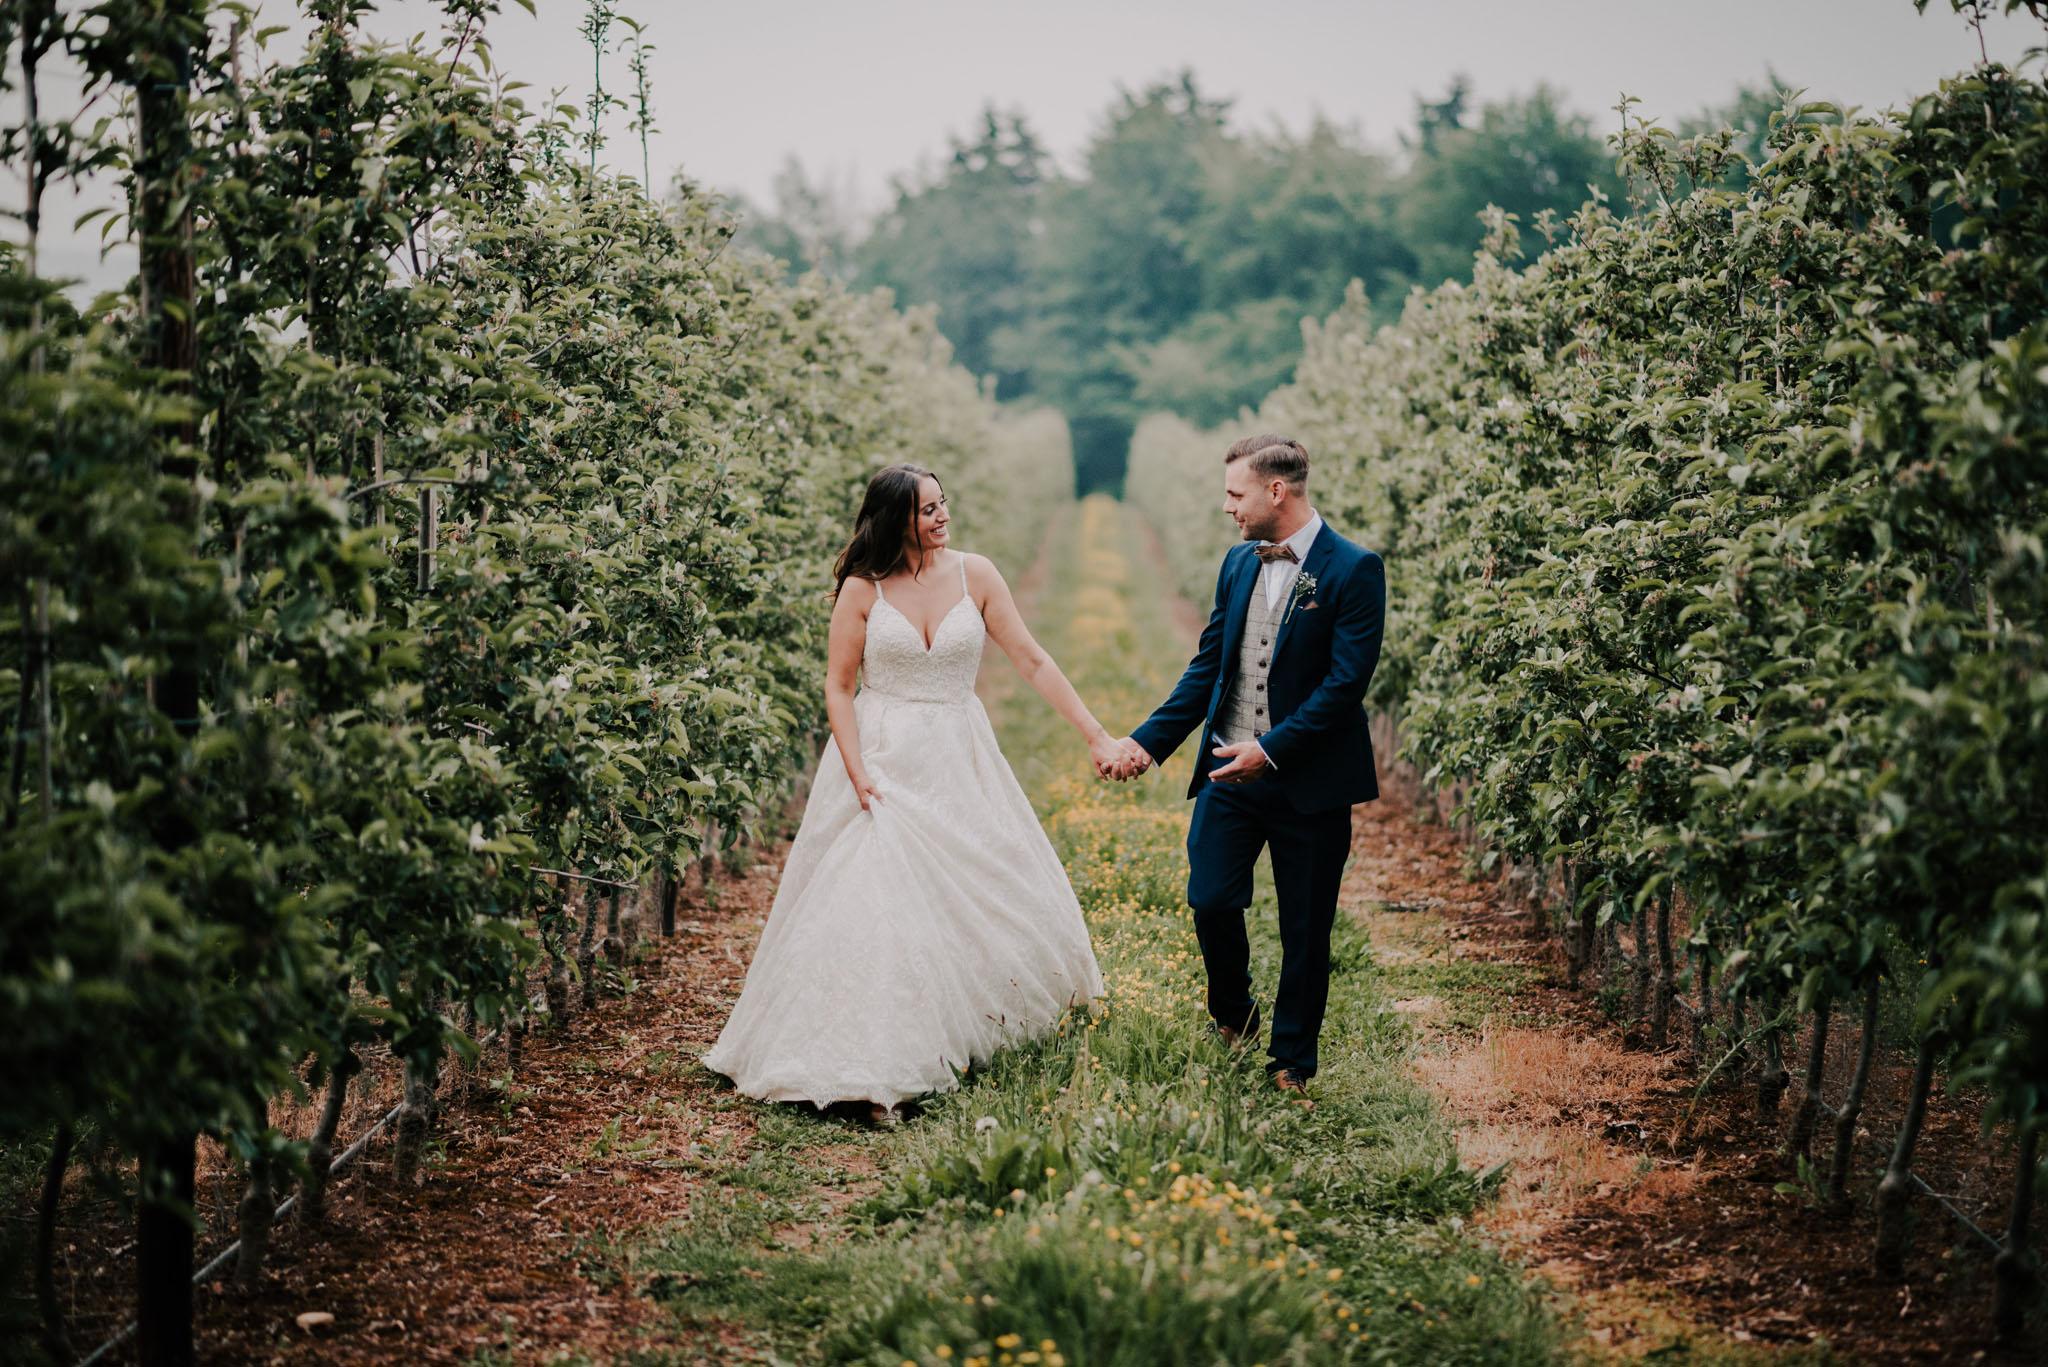 wedding-photographer-glewstone-court-hereford-scott-stockwell-photography460.jpg